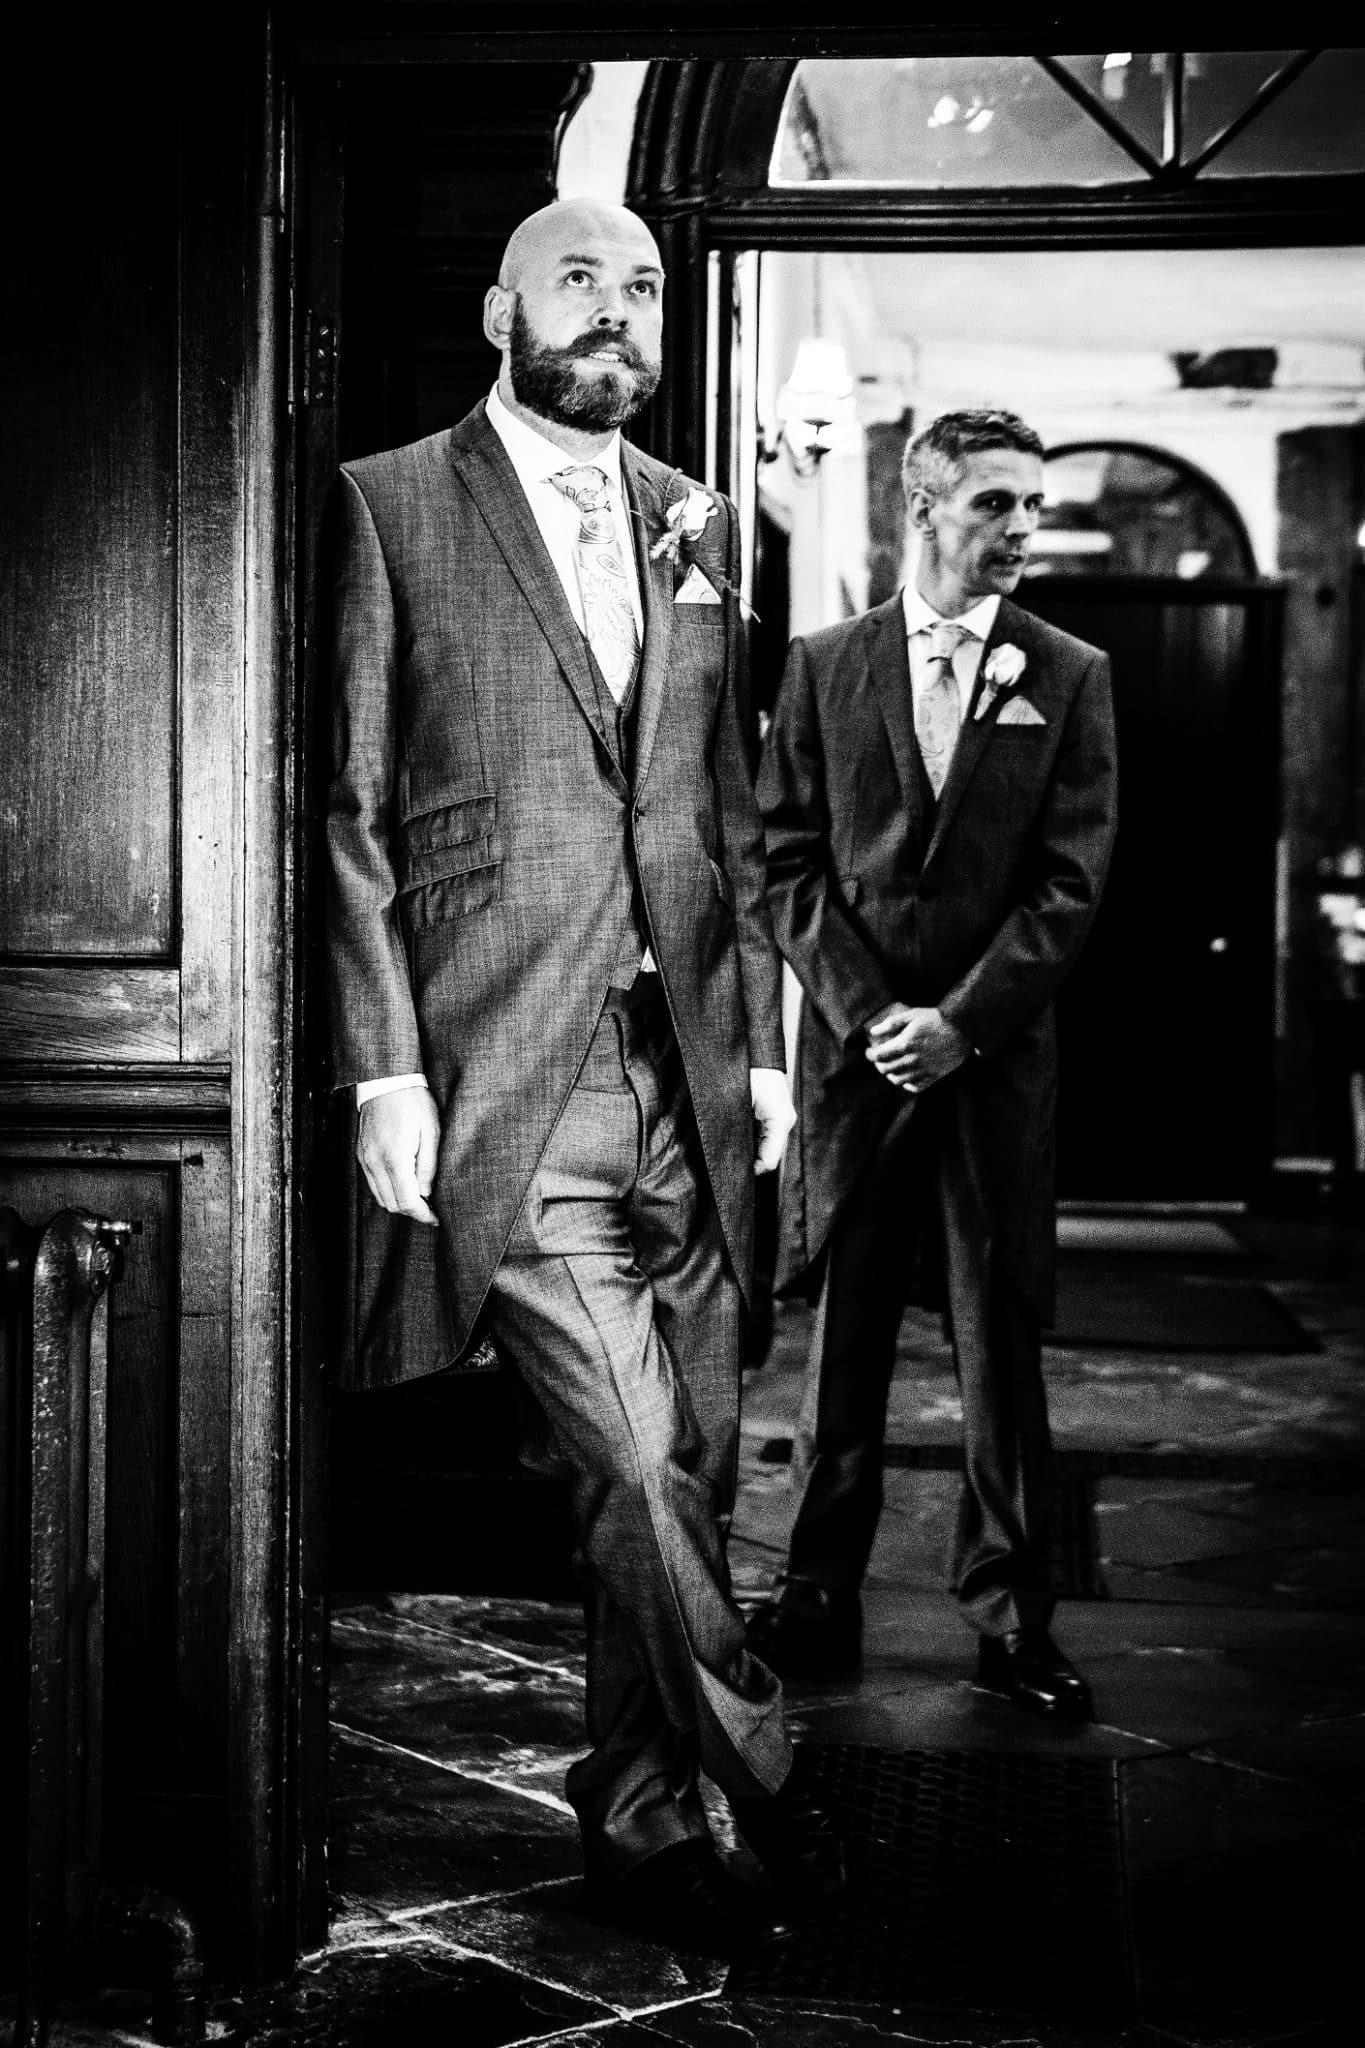 wedding-photography-at-the-cheshire-wedding-venue-adlington-hall